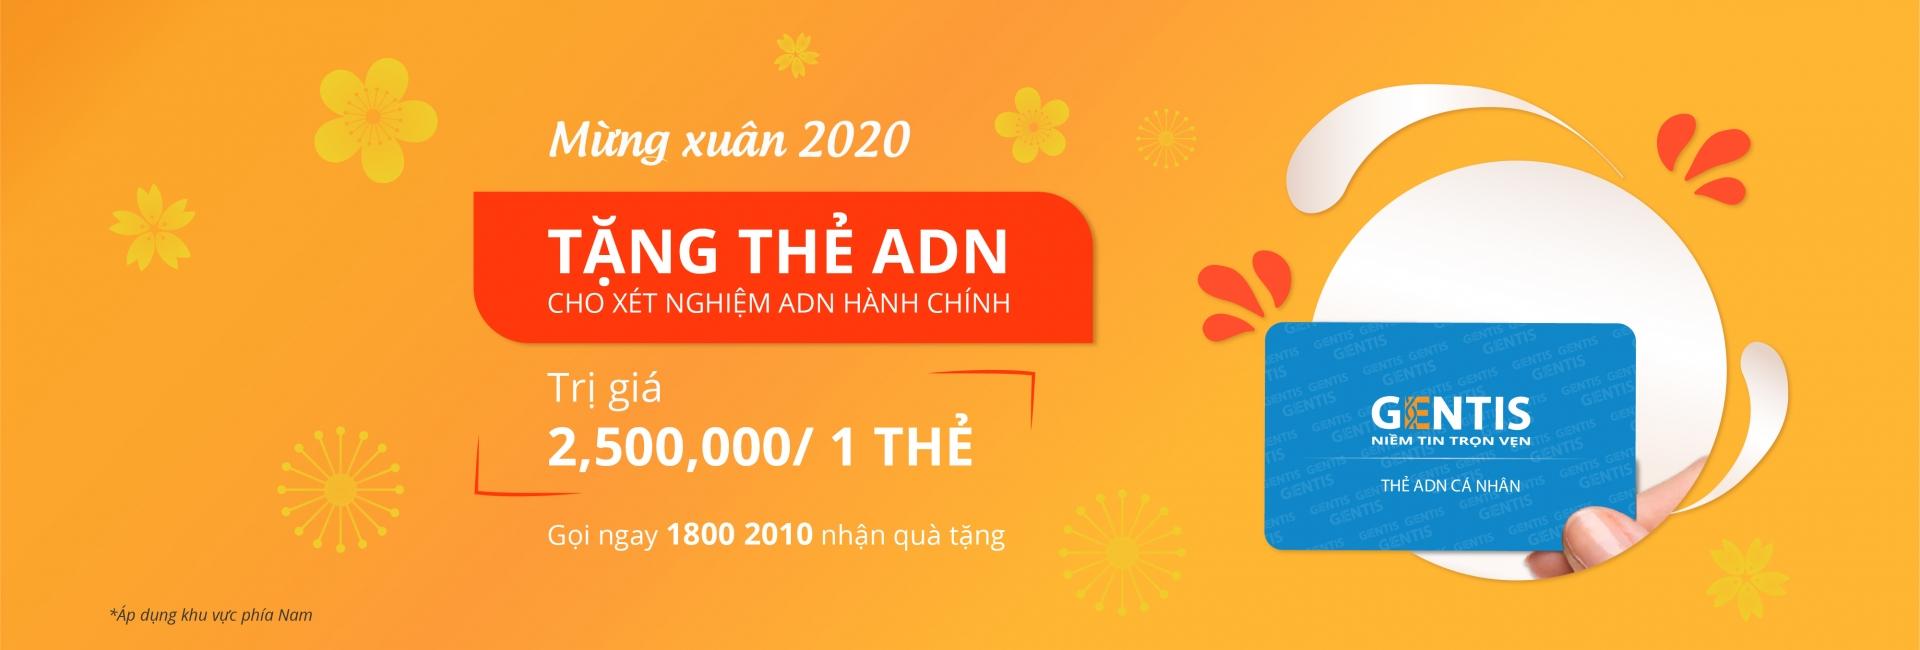 banner/tang_the_adn_2020-01.jpg